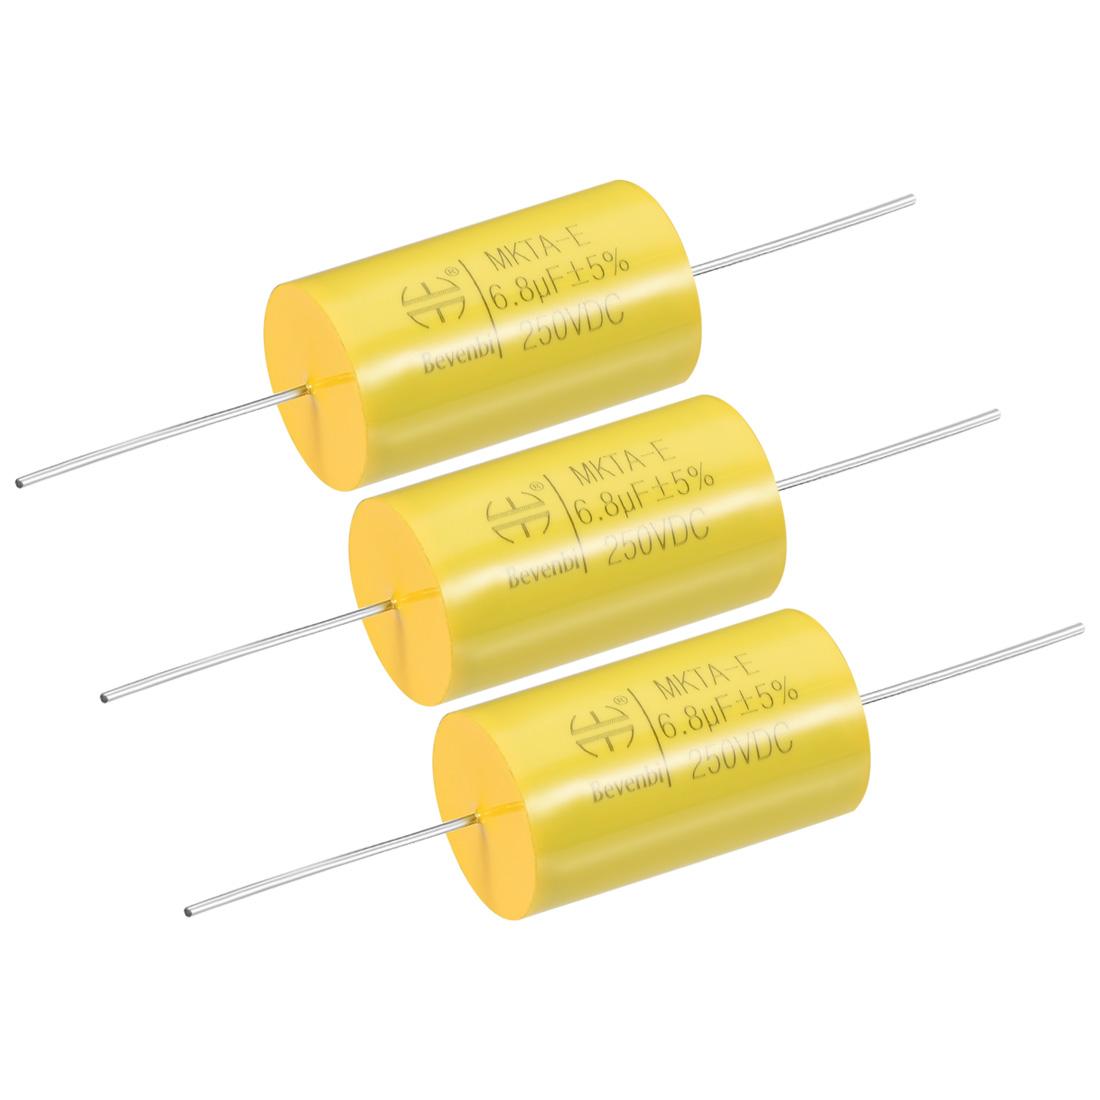 Film Capacitor 250V DC 6.8uF MKTA-E Round Polypropylene Capacitors Yellow 3pcs